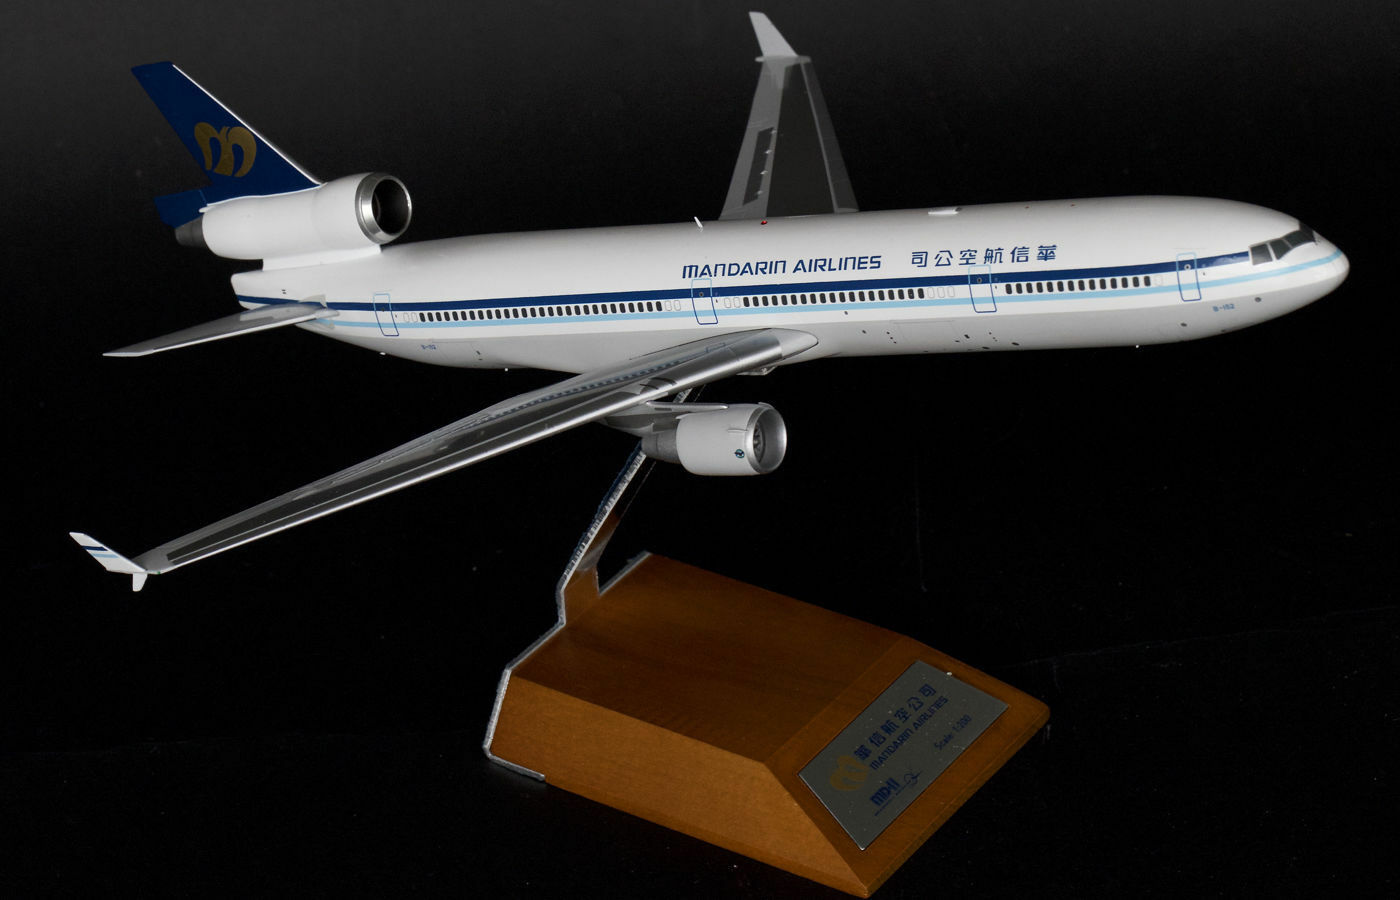 JC Wings 1 200 Mandarin Airlines McDonnell Douglas MD-11 B-152 (XX2338)